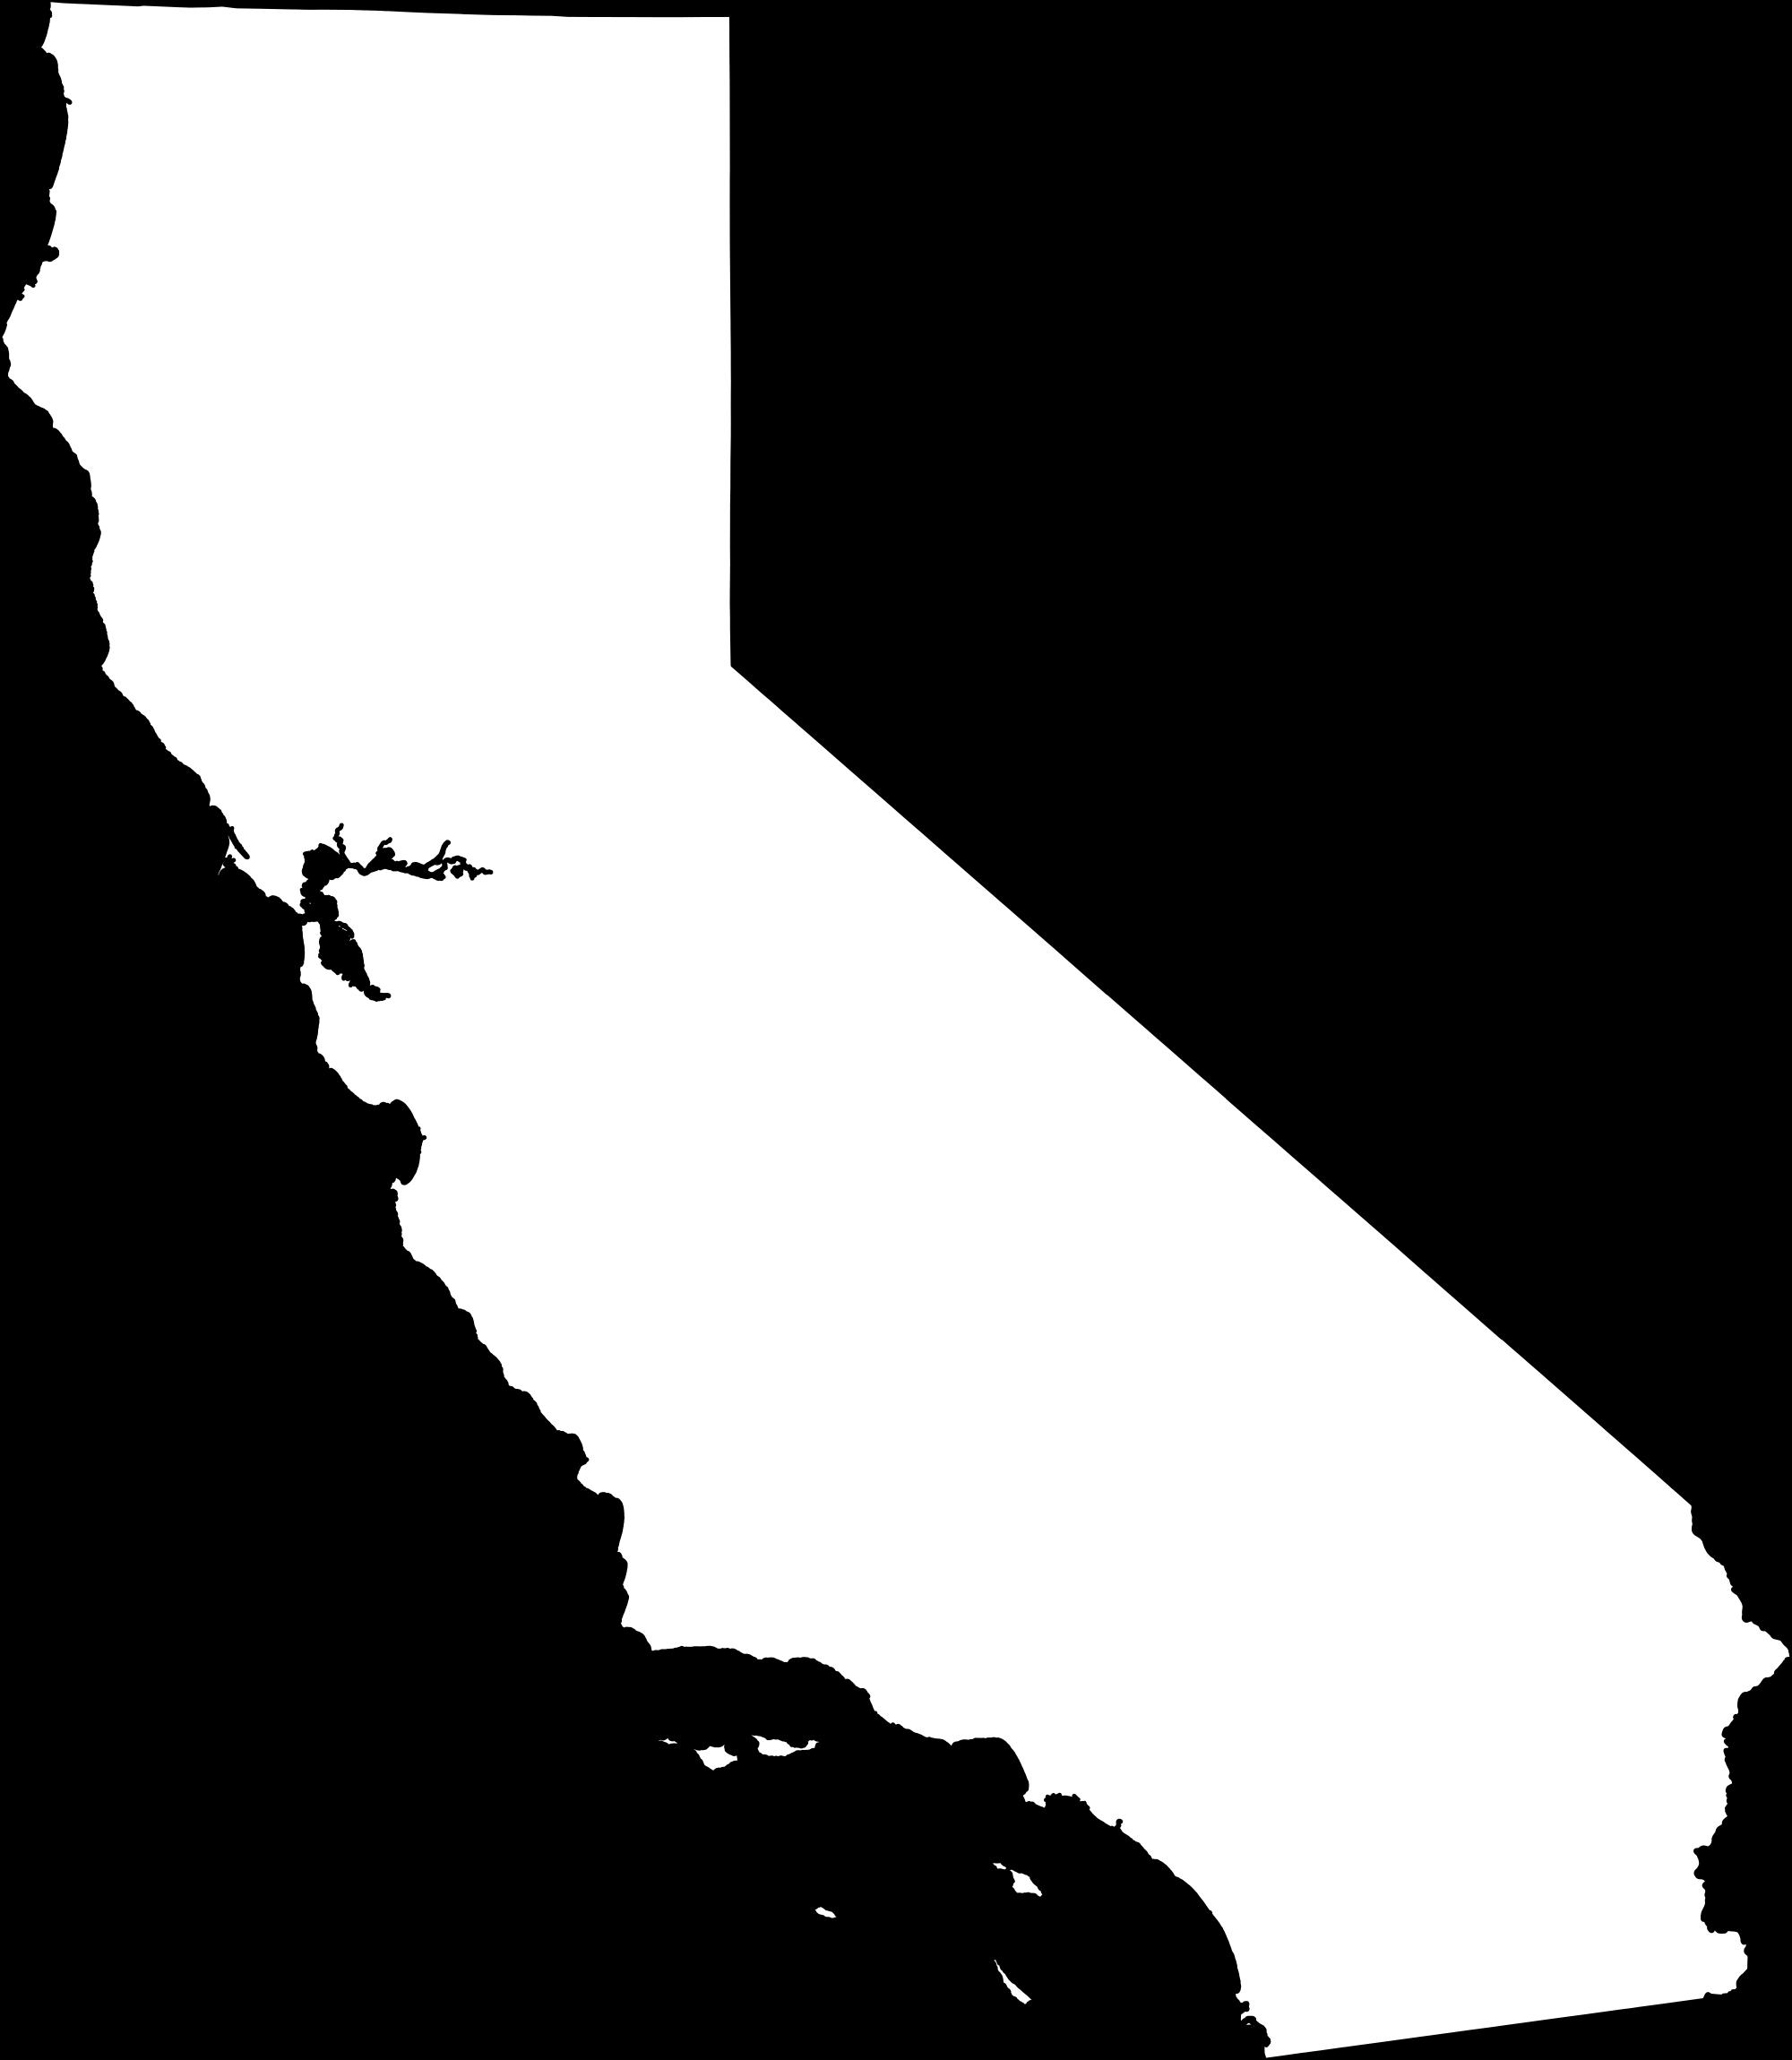 California Map PNG Transparent California Map.PNG Images. | PlusPNG